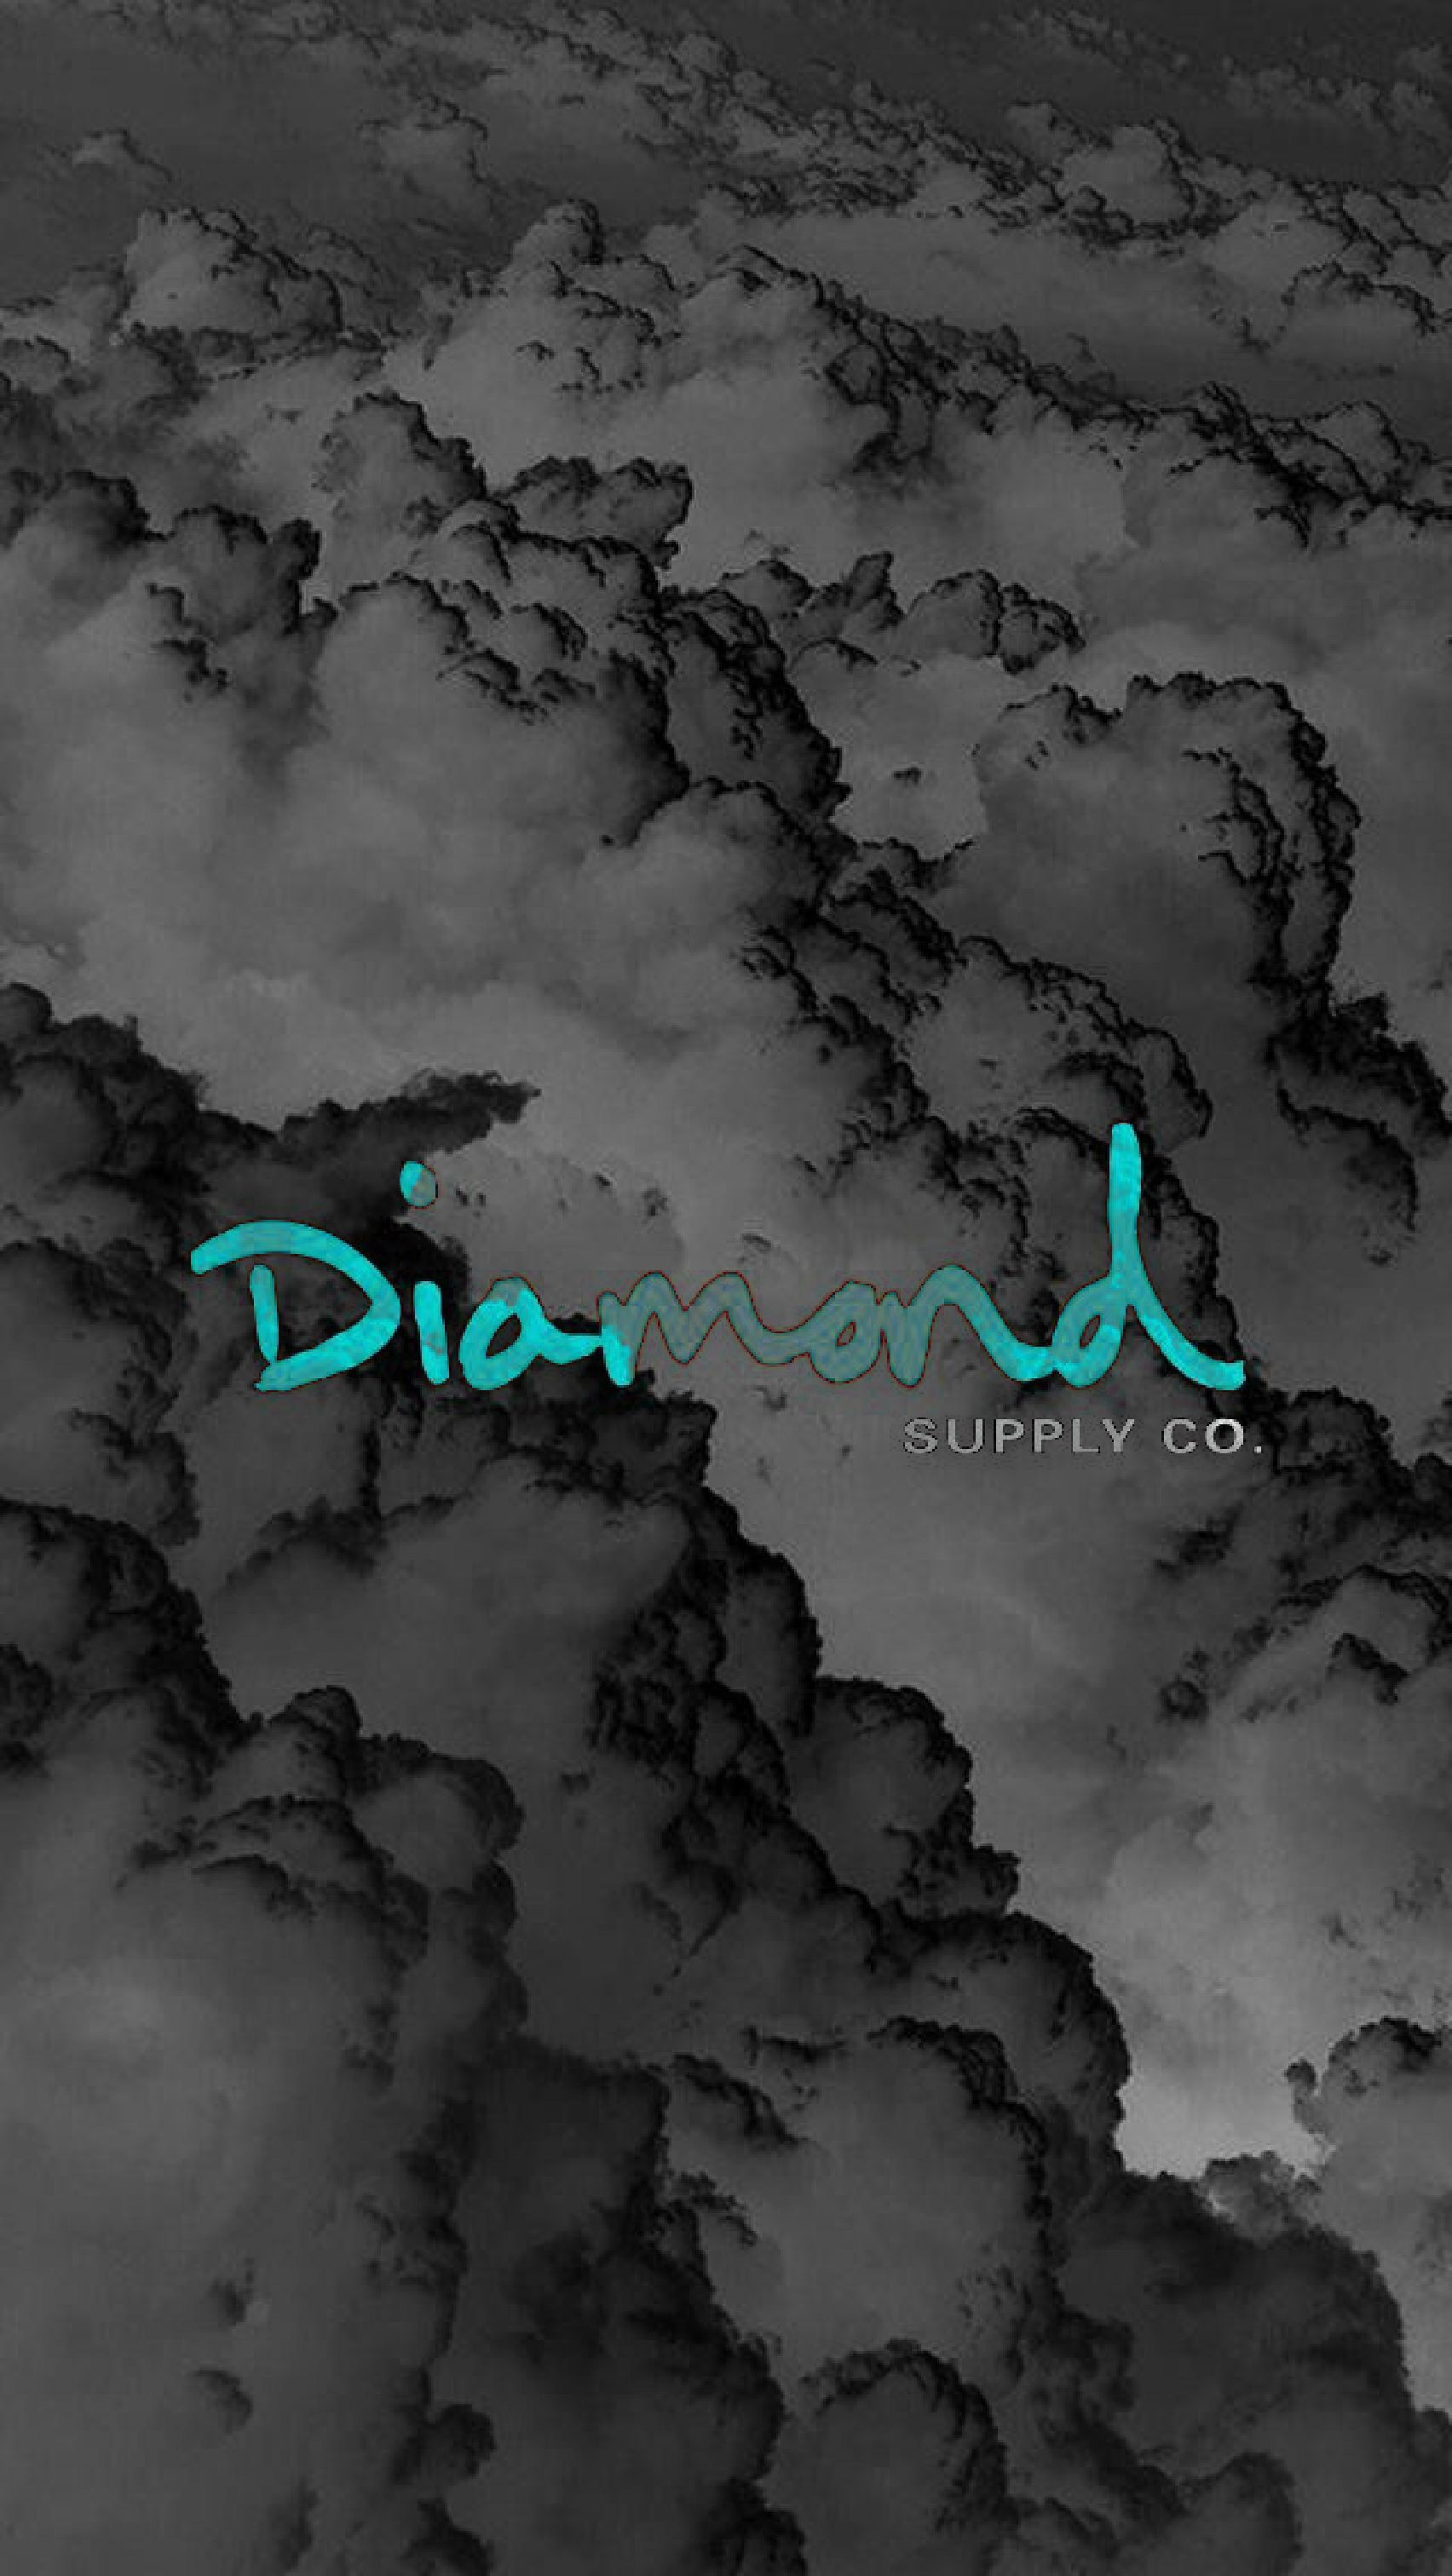 Liftedmiles Xist Diamondsupplyco Diamond Supply Co Wallpaper 1st Original Print Diamonds Diamond Supply Co Wallpaper Diamond Wallpaper Homescreen Wallpaper